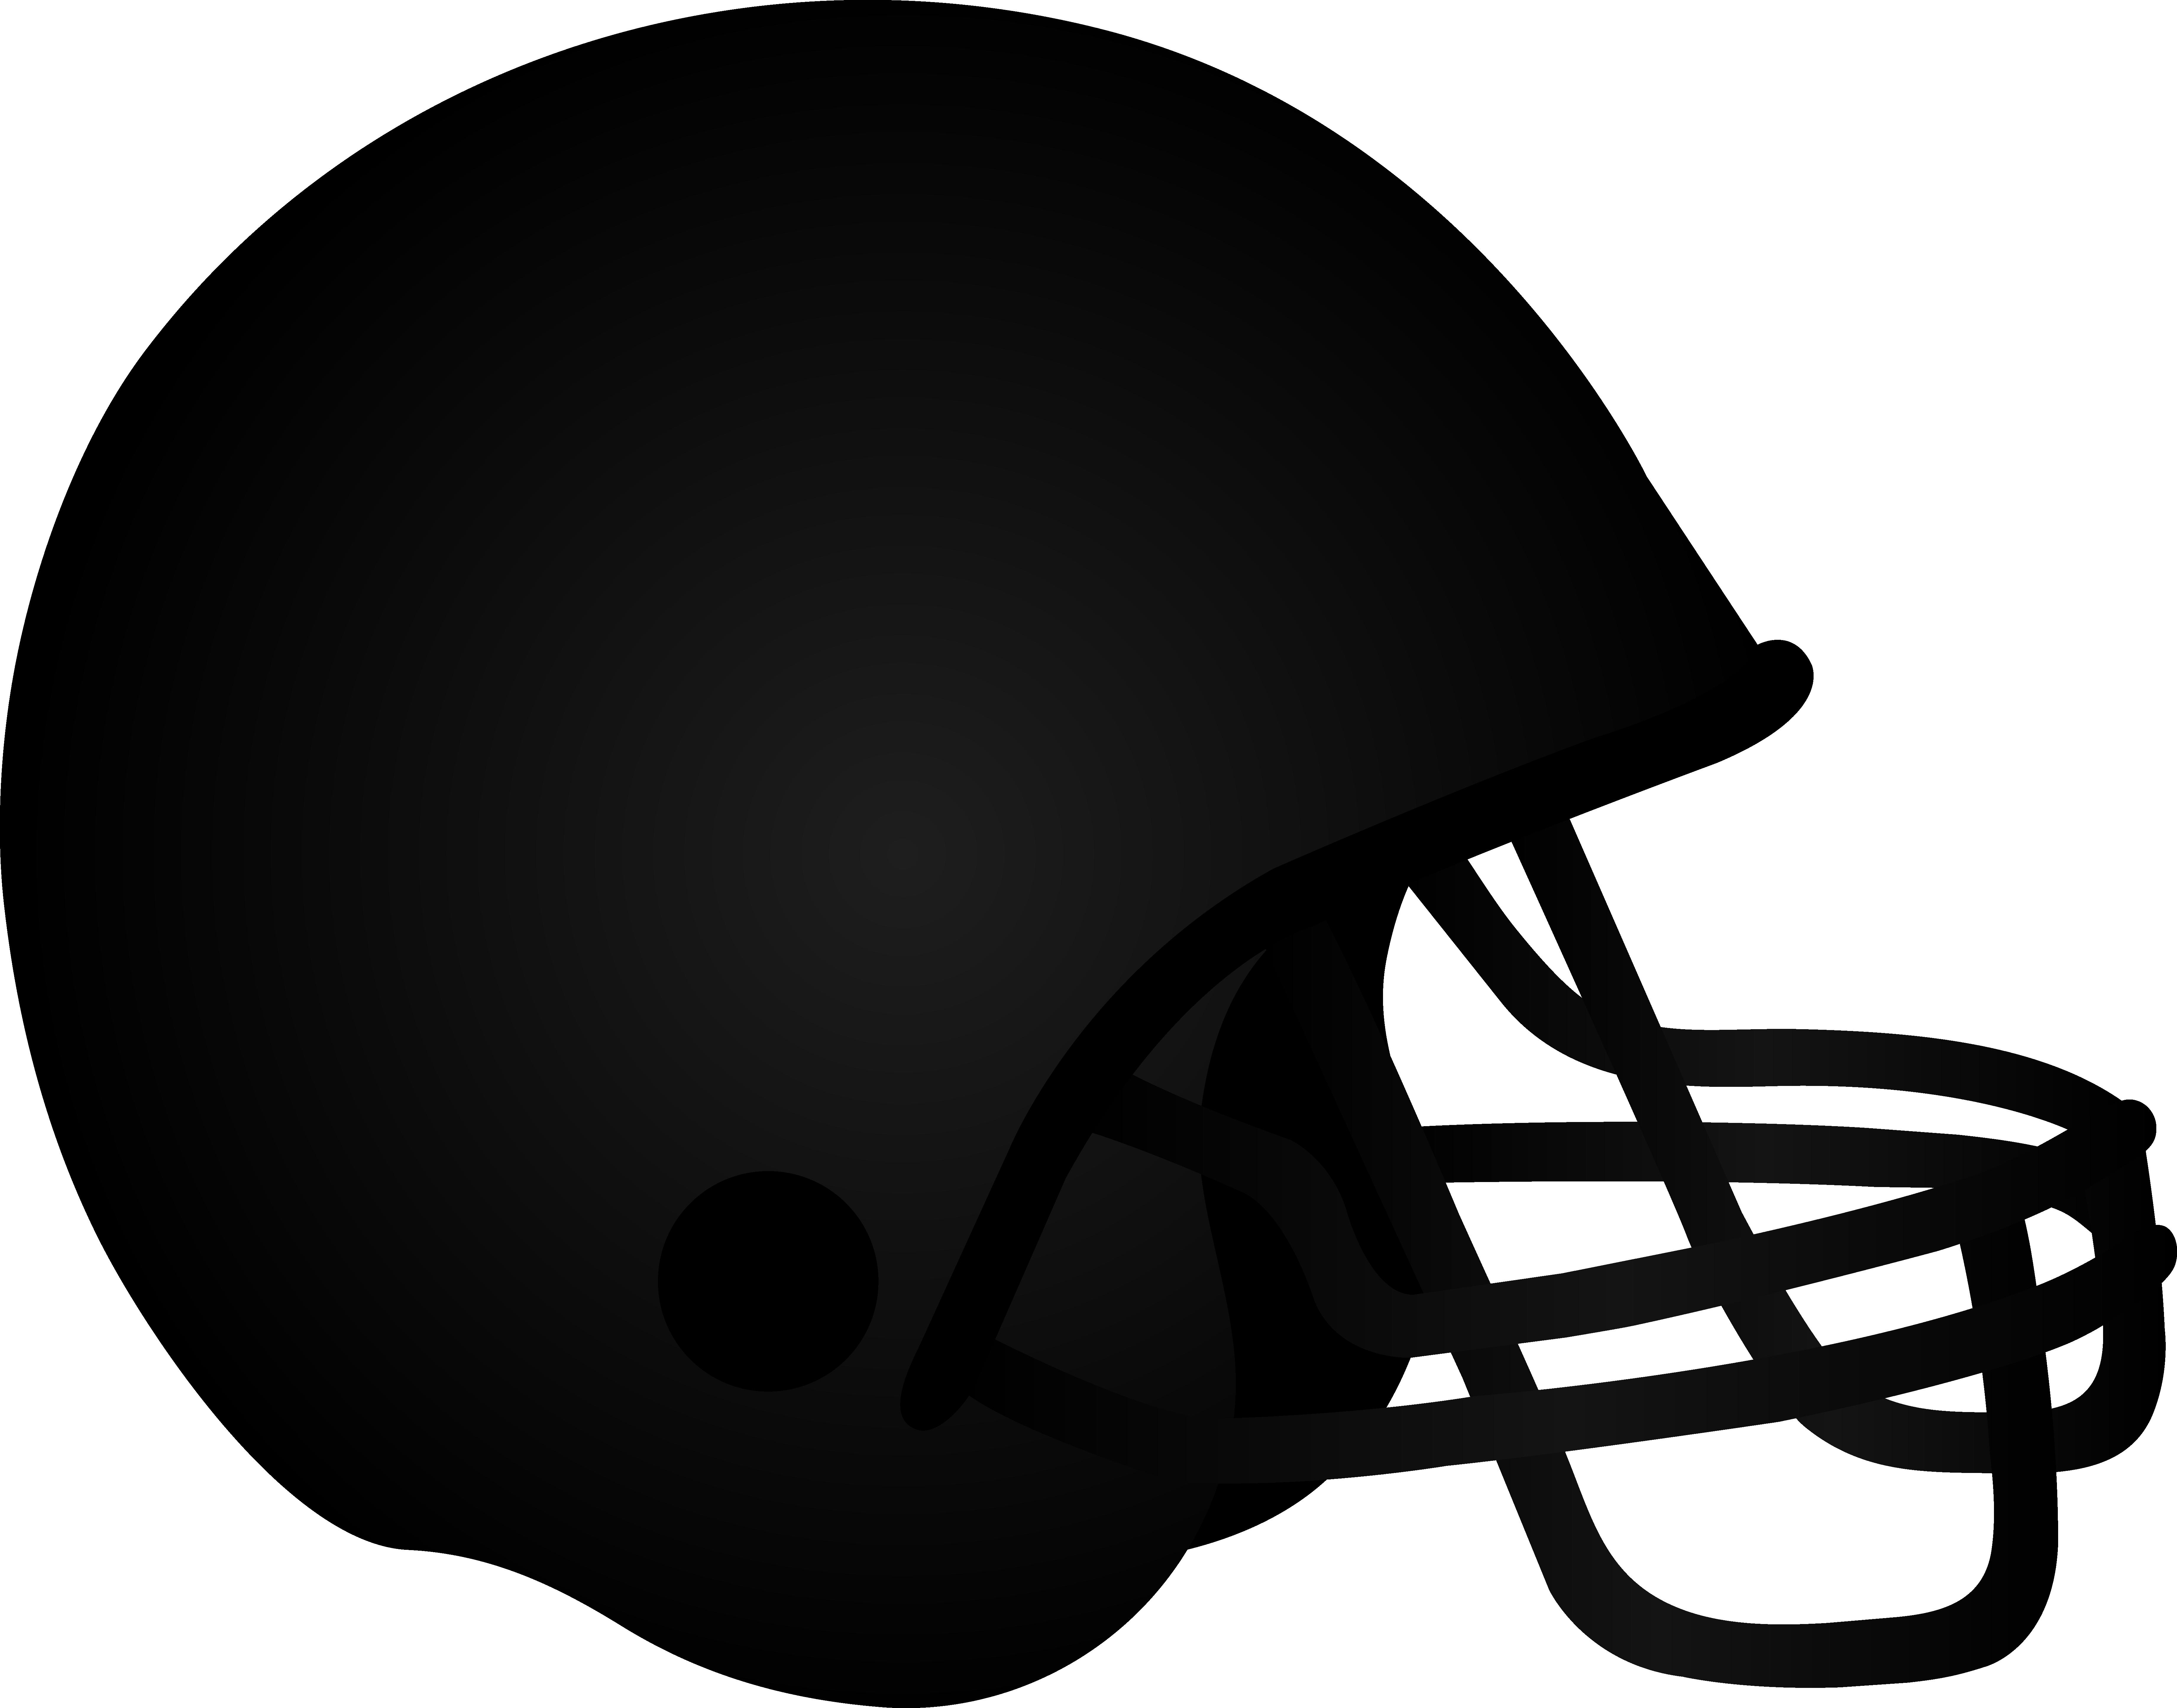 7362x5777 Football Helmet Clip Art Black And White Many Interesting Cliparts